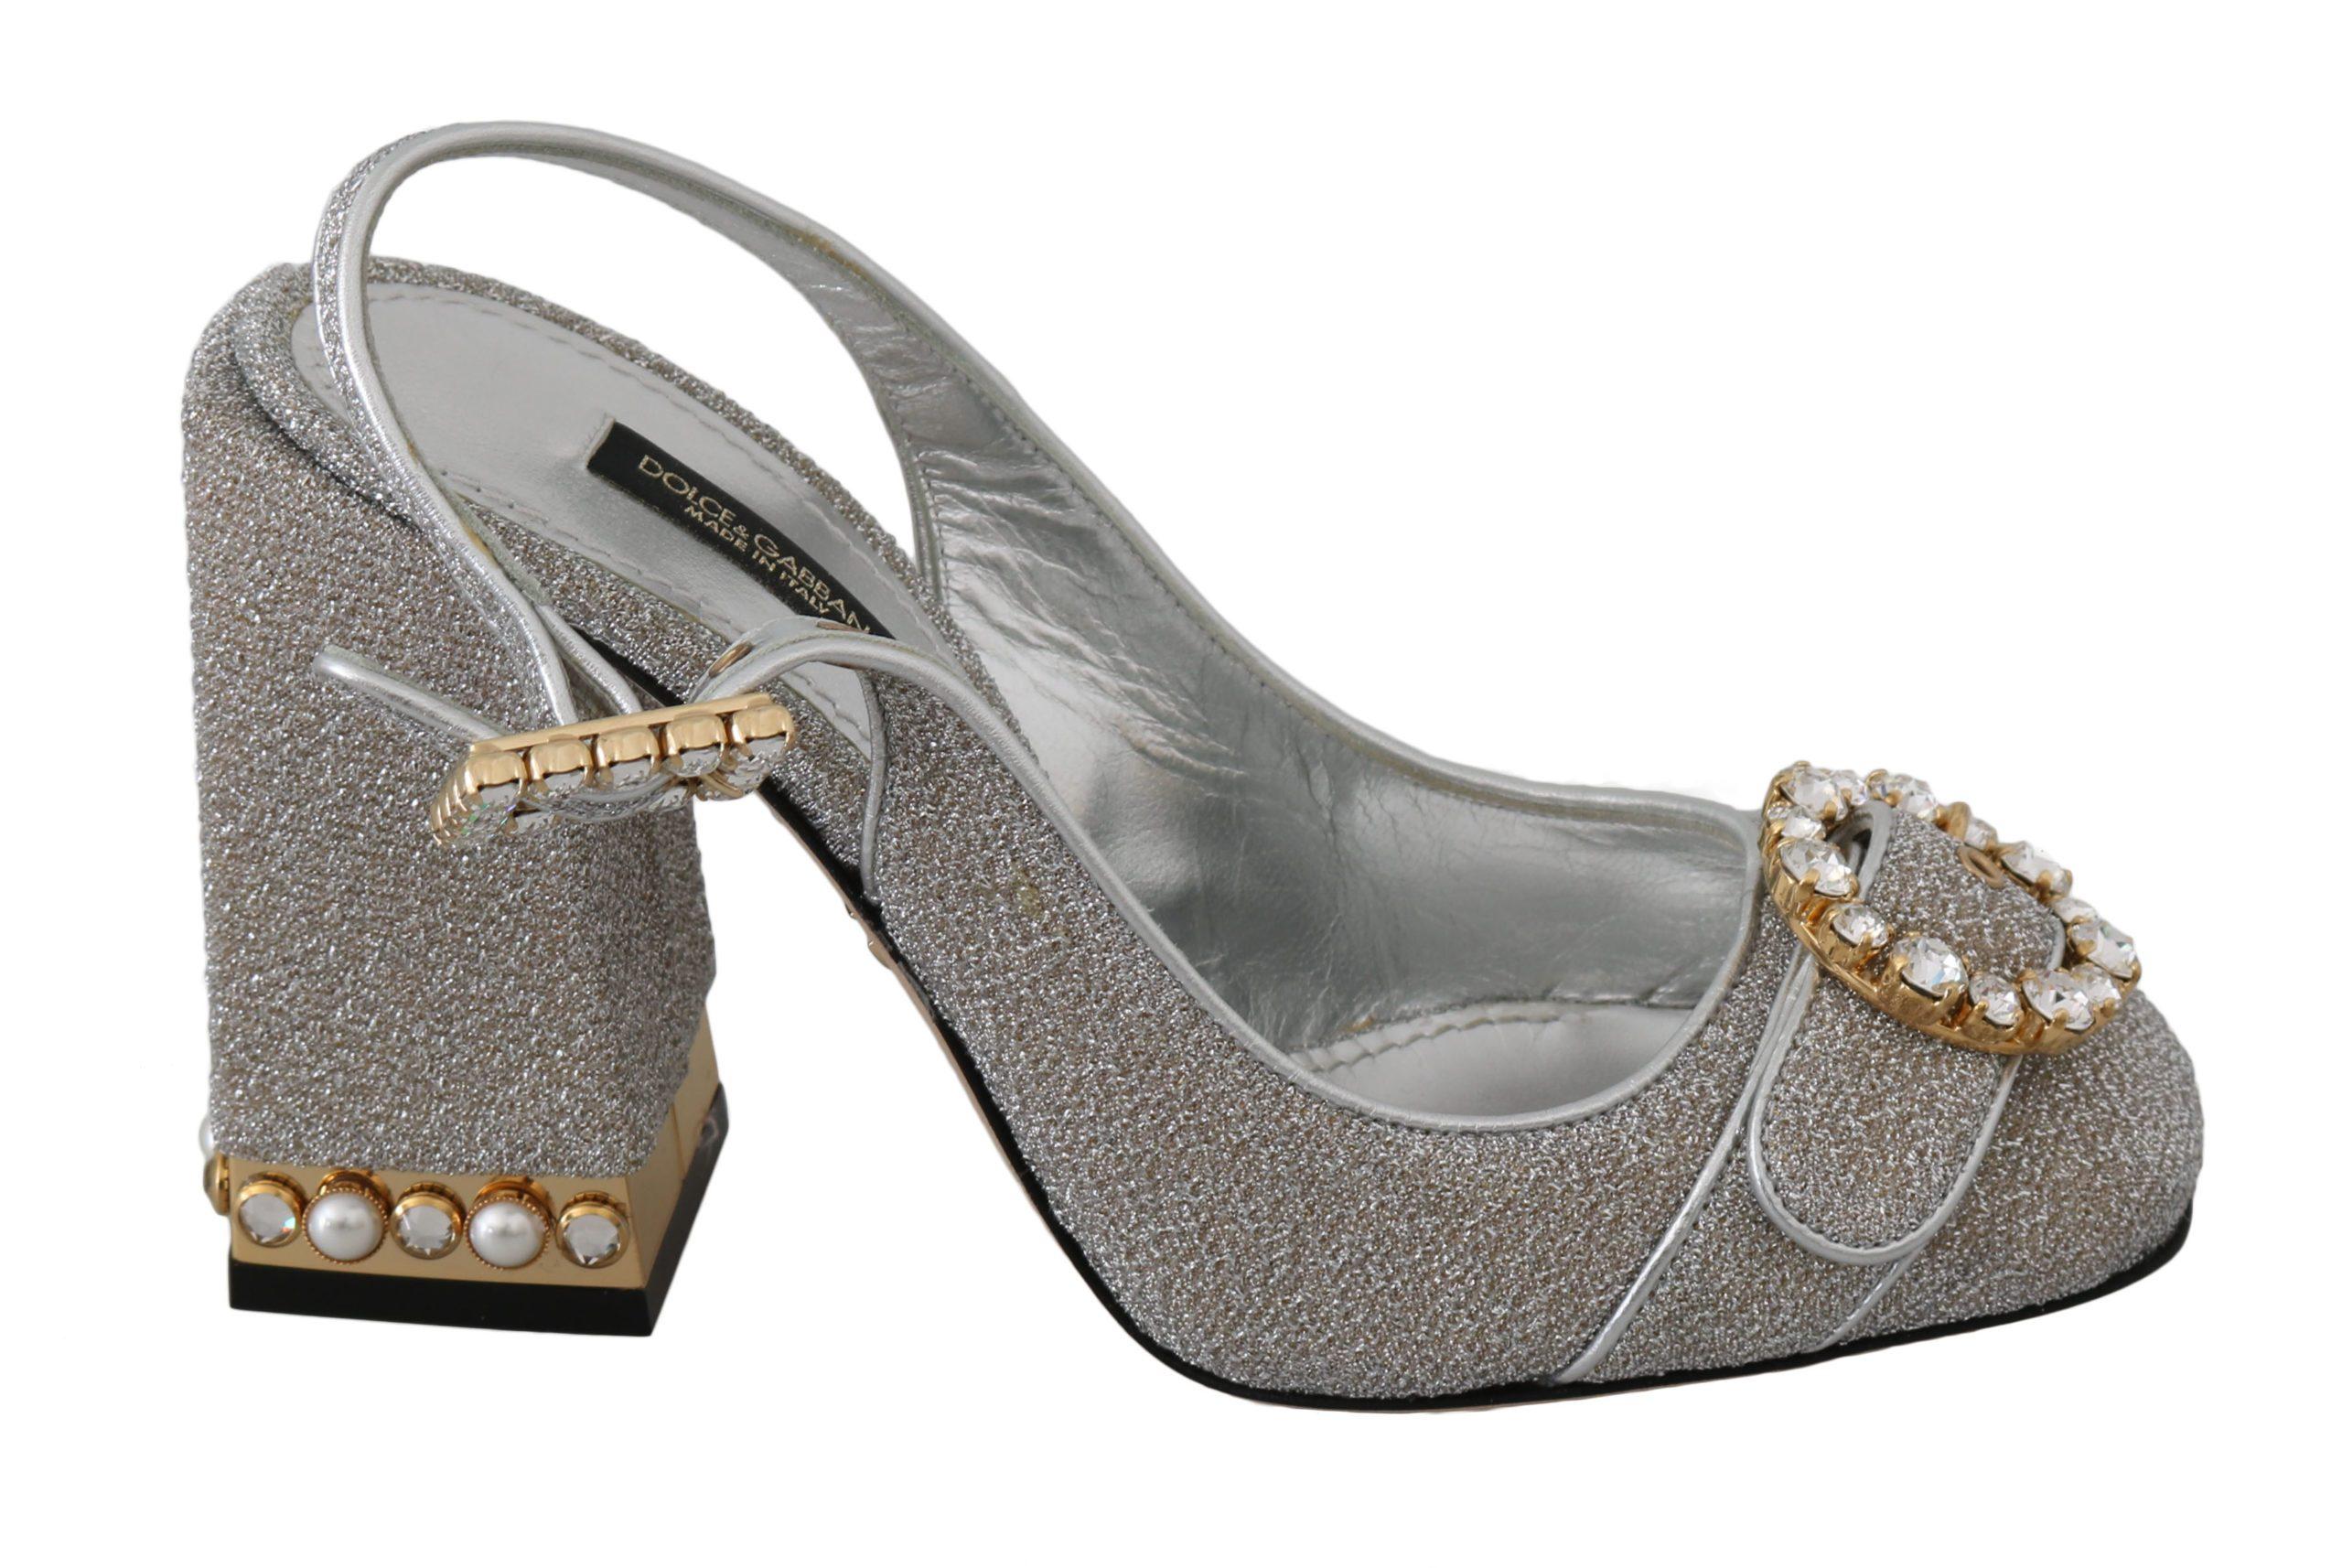 Dolce & Gabbana Women's Shiny Crystal Sandals Shoes Silver LA6307 - EU35.5/US5